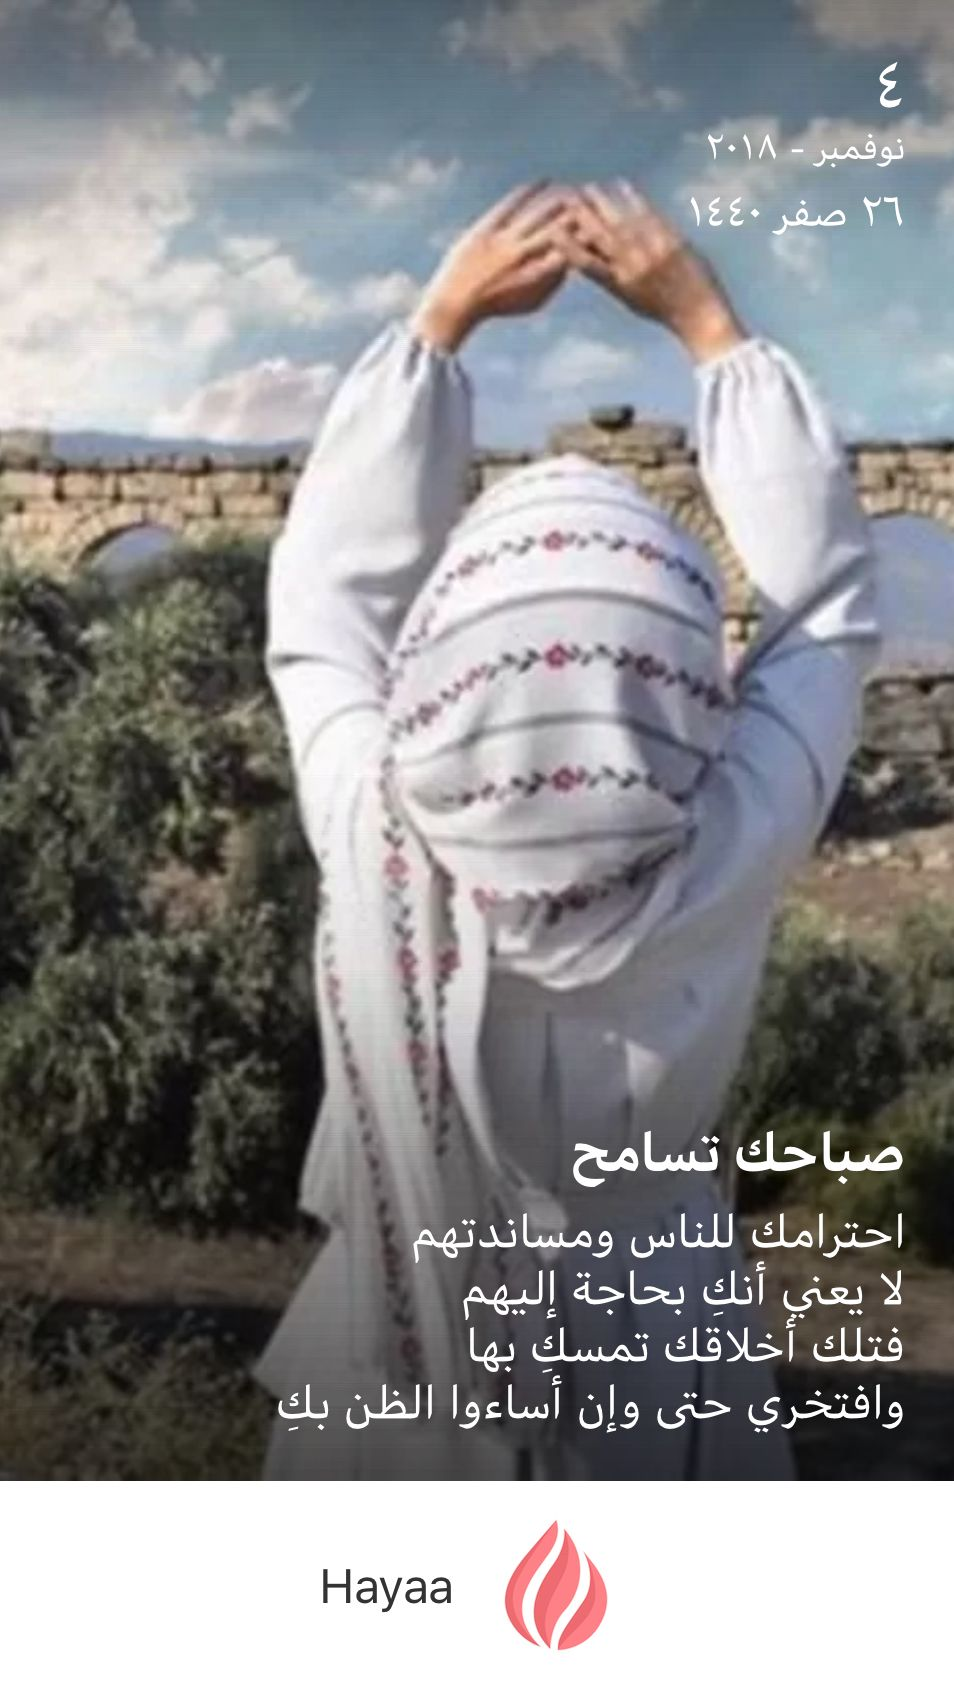 Pin by Maryam Almohuorfi on Arabic words Happy new year